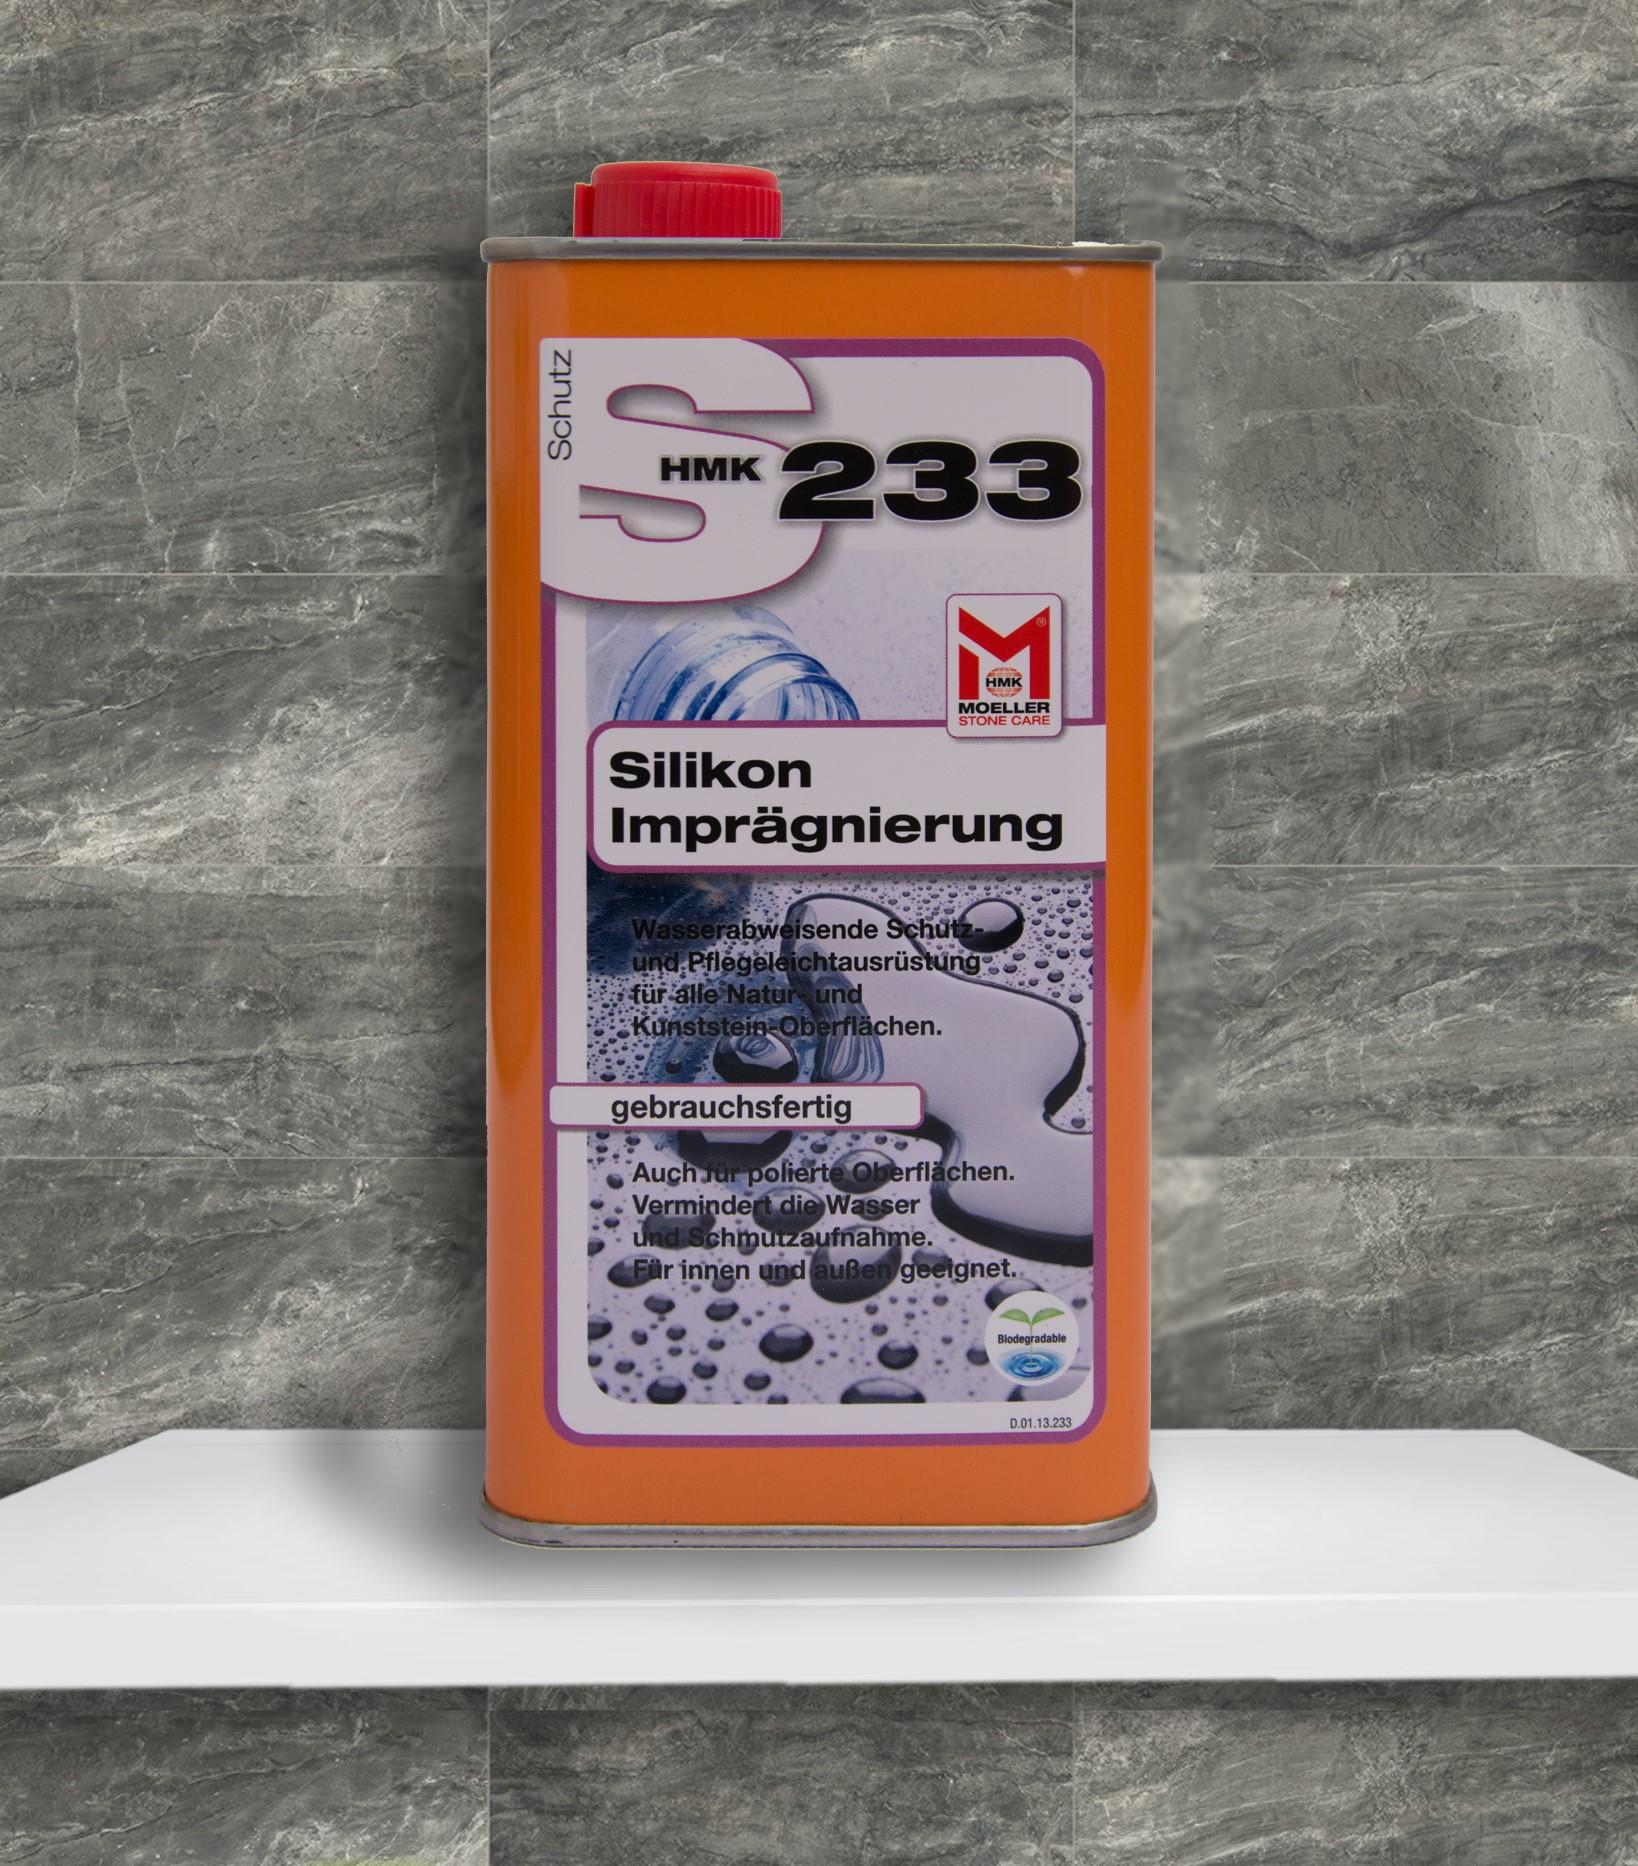 HMK S233 Silikon-Imprägnierung